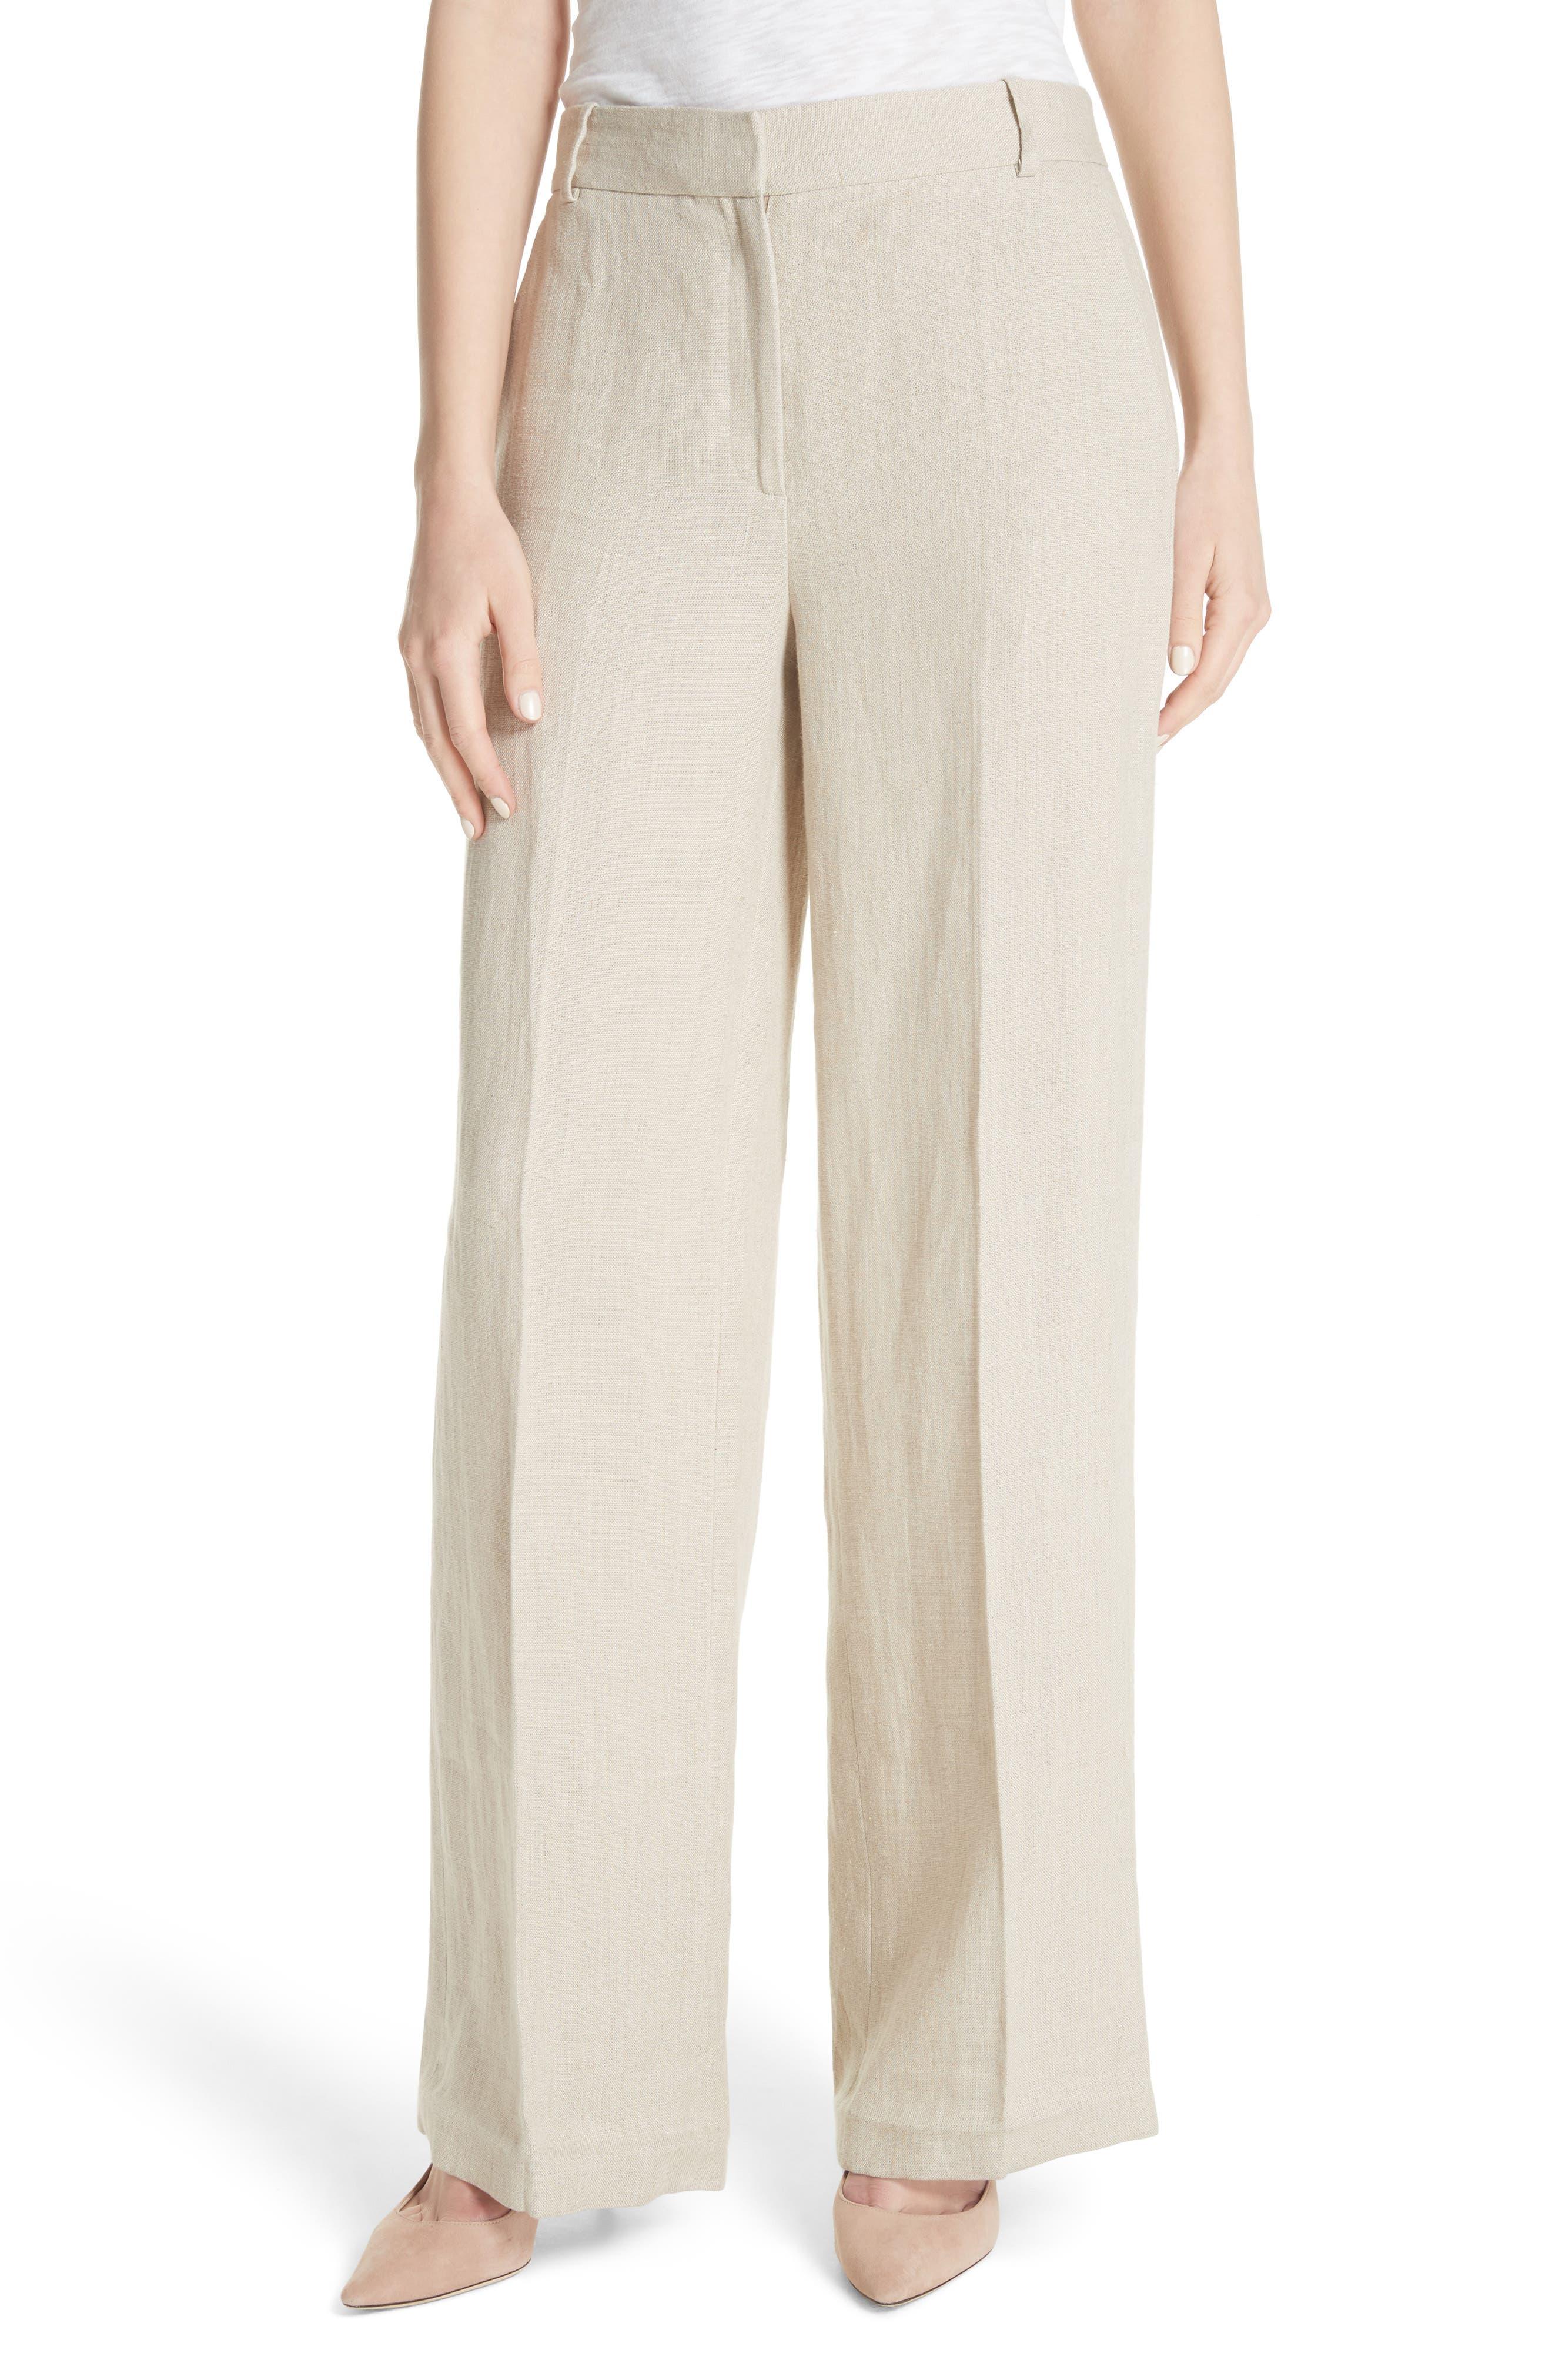 Piazza Integrate Wide Leg Linen Pants,                         Main,                         color, 250